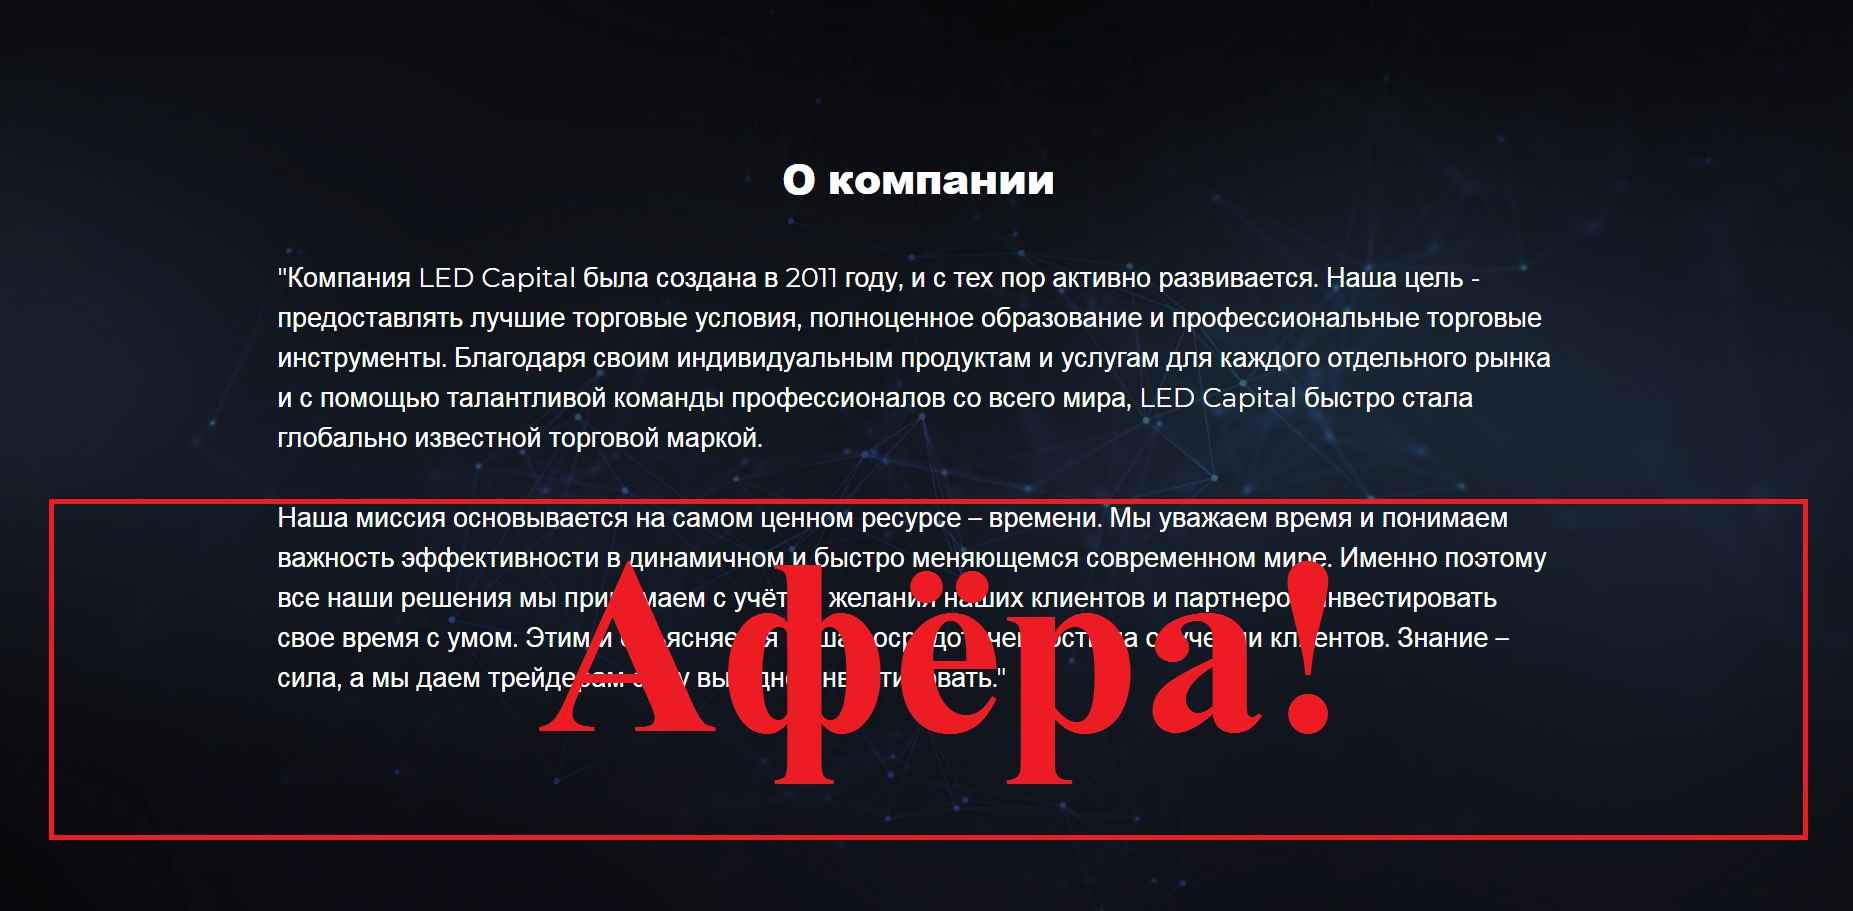 LED Capital – обзор брокера led-capital.com отзывы